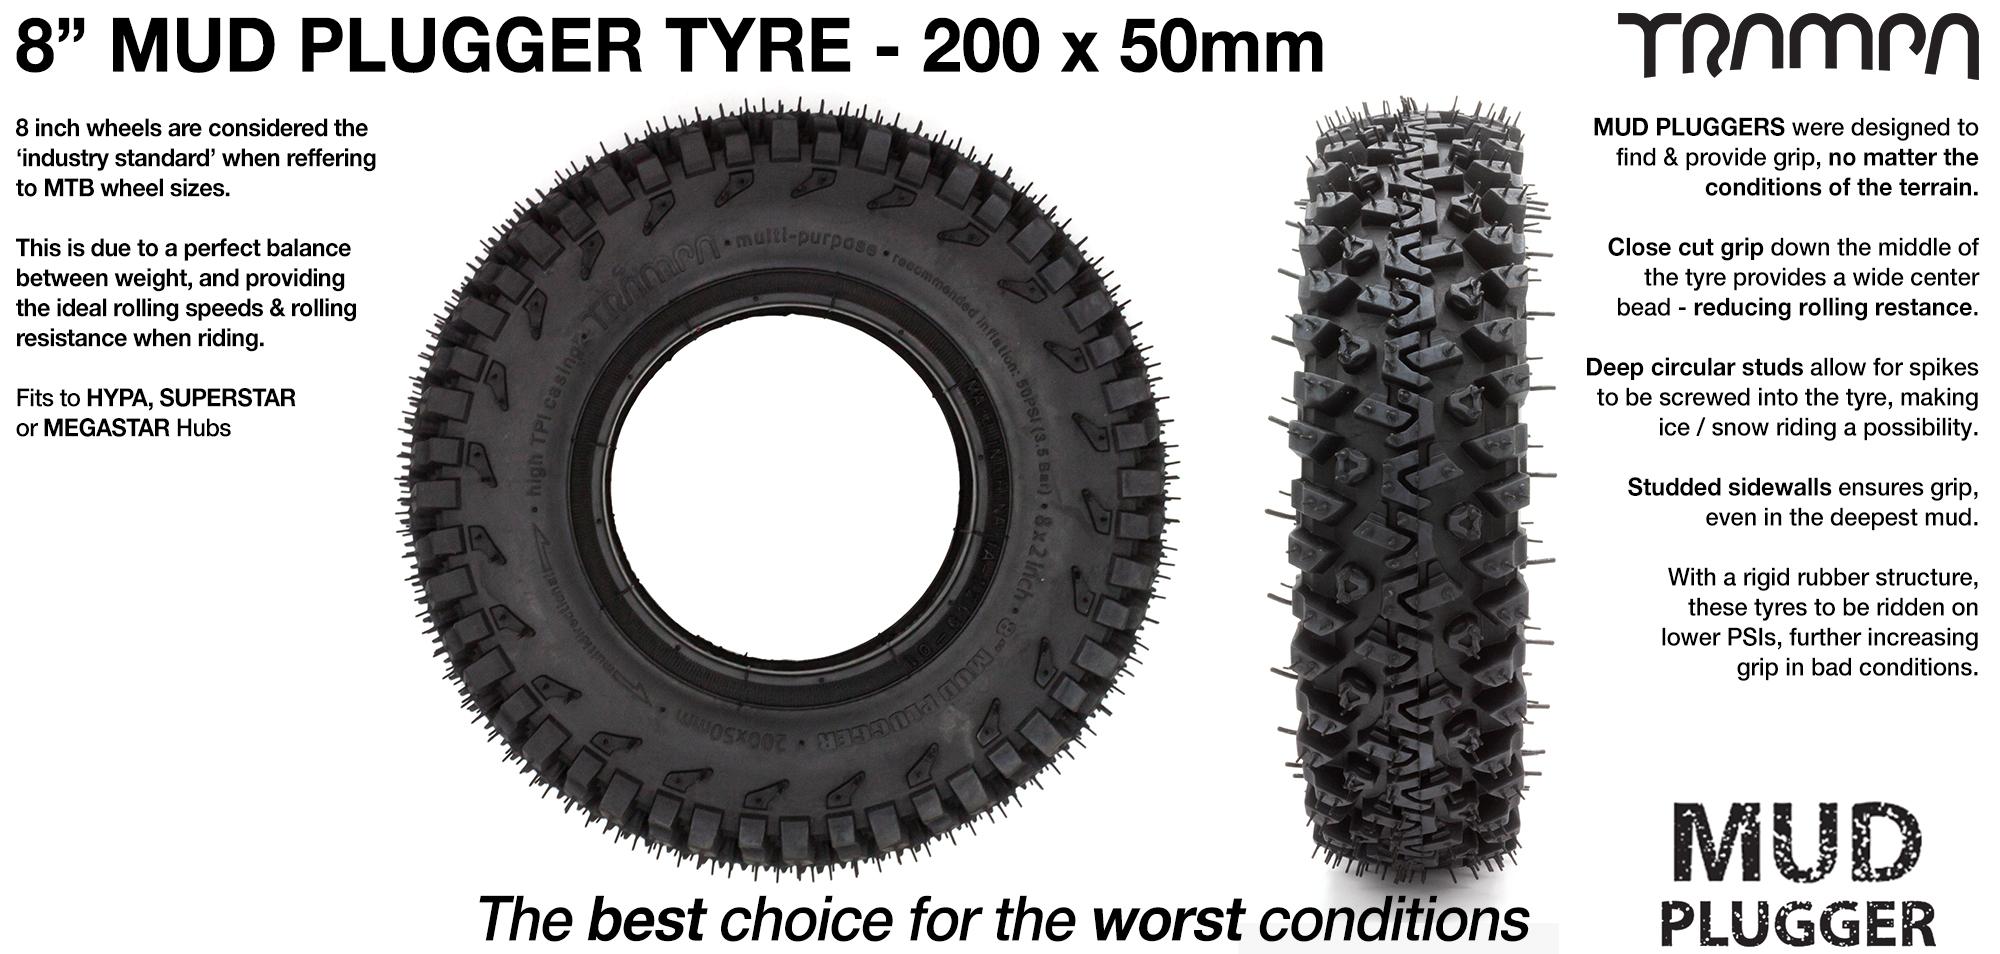 INNOVA MUDPLUGGER - 8 Inch Soft packed Dirt Tyre